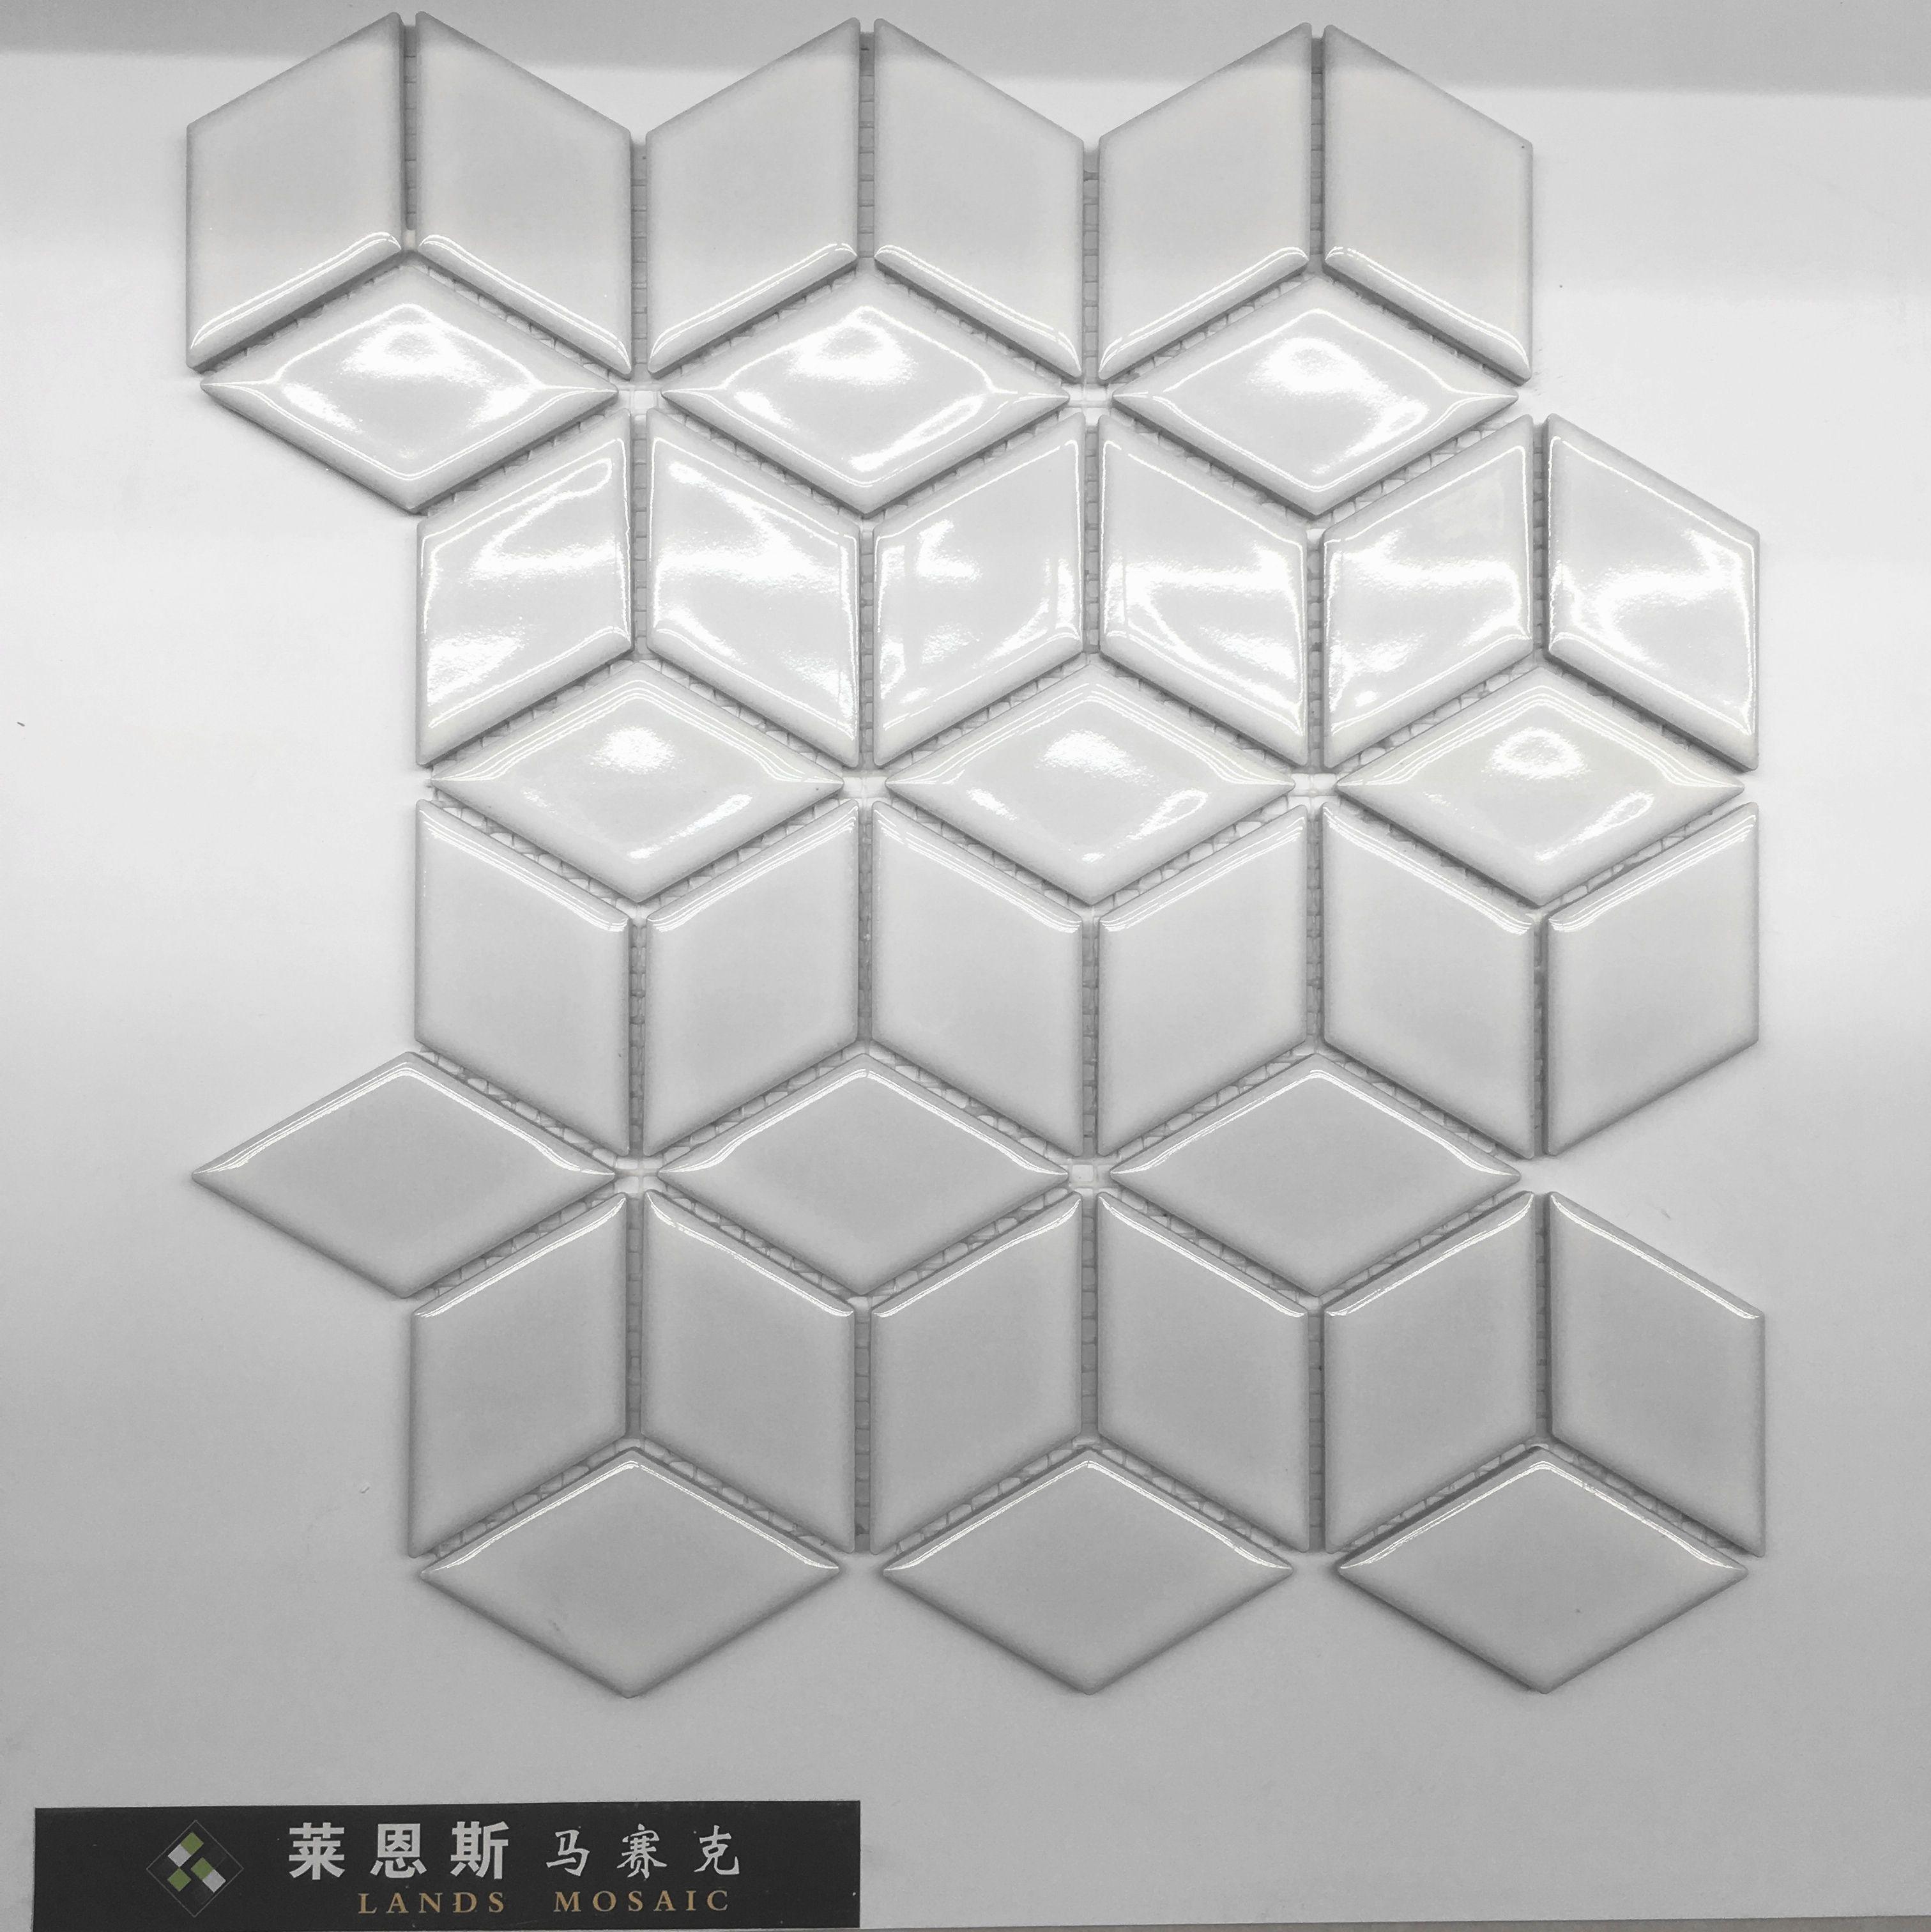 Comfortable 12 Ceiling Tiles Big 12X12 Vinyl Floor Tile Rectangular 18 X 18 Ceramic Tile 6 X 12 Porcelain Floor Tile Youthful Accoustic Ceiling Tiles PurpleAcoustic Ceiling Tiles Home Depot 2018 3d White Glossy Porcelain Mosaic Tiles,Diamond Wall Ceramic ..